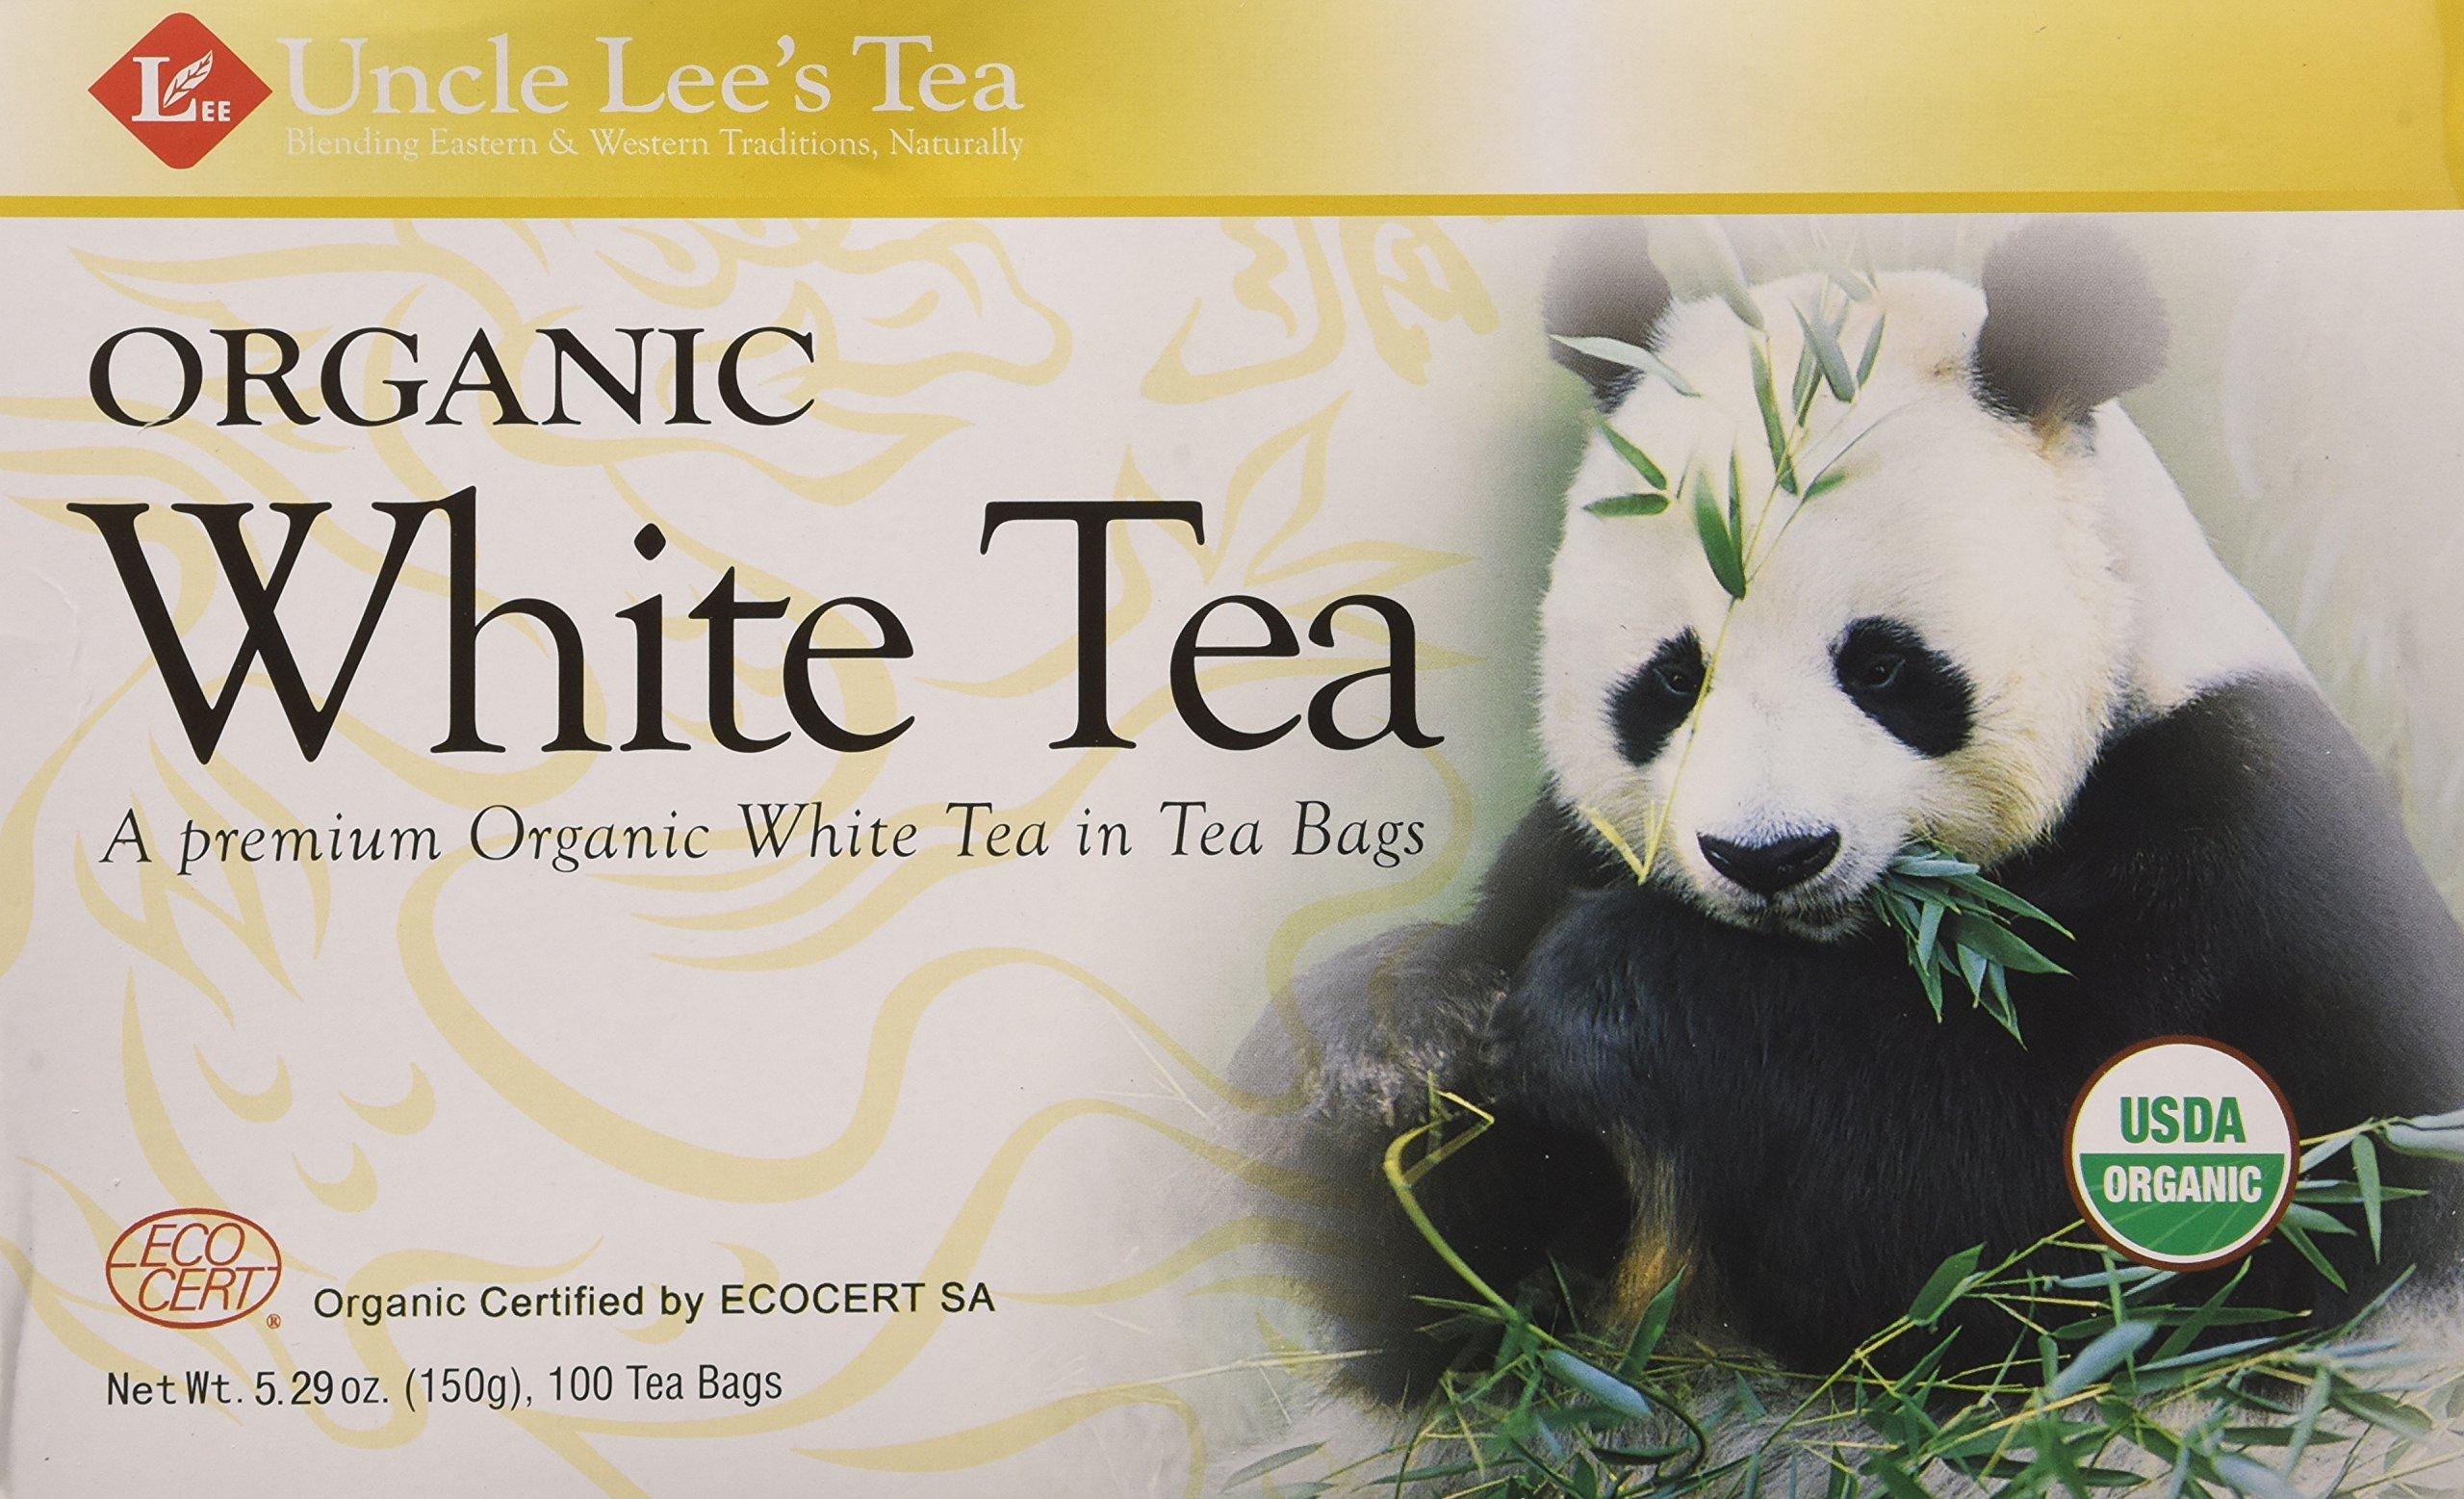 Uncle Les's Tea- Organic White Tea, premium organic White Tea in Tea Bags 100ct